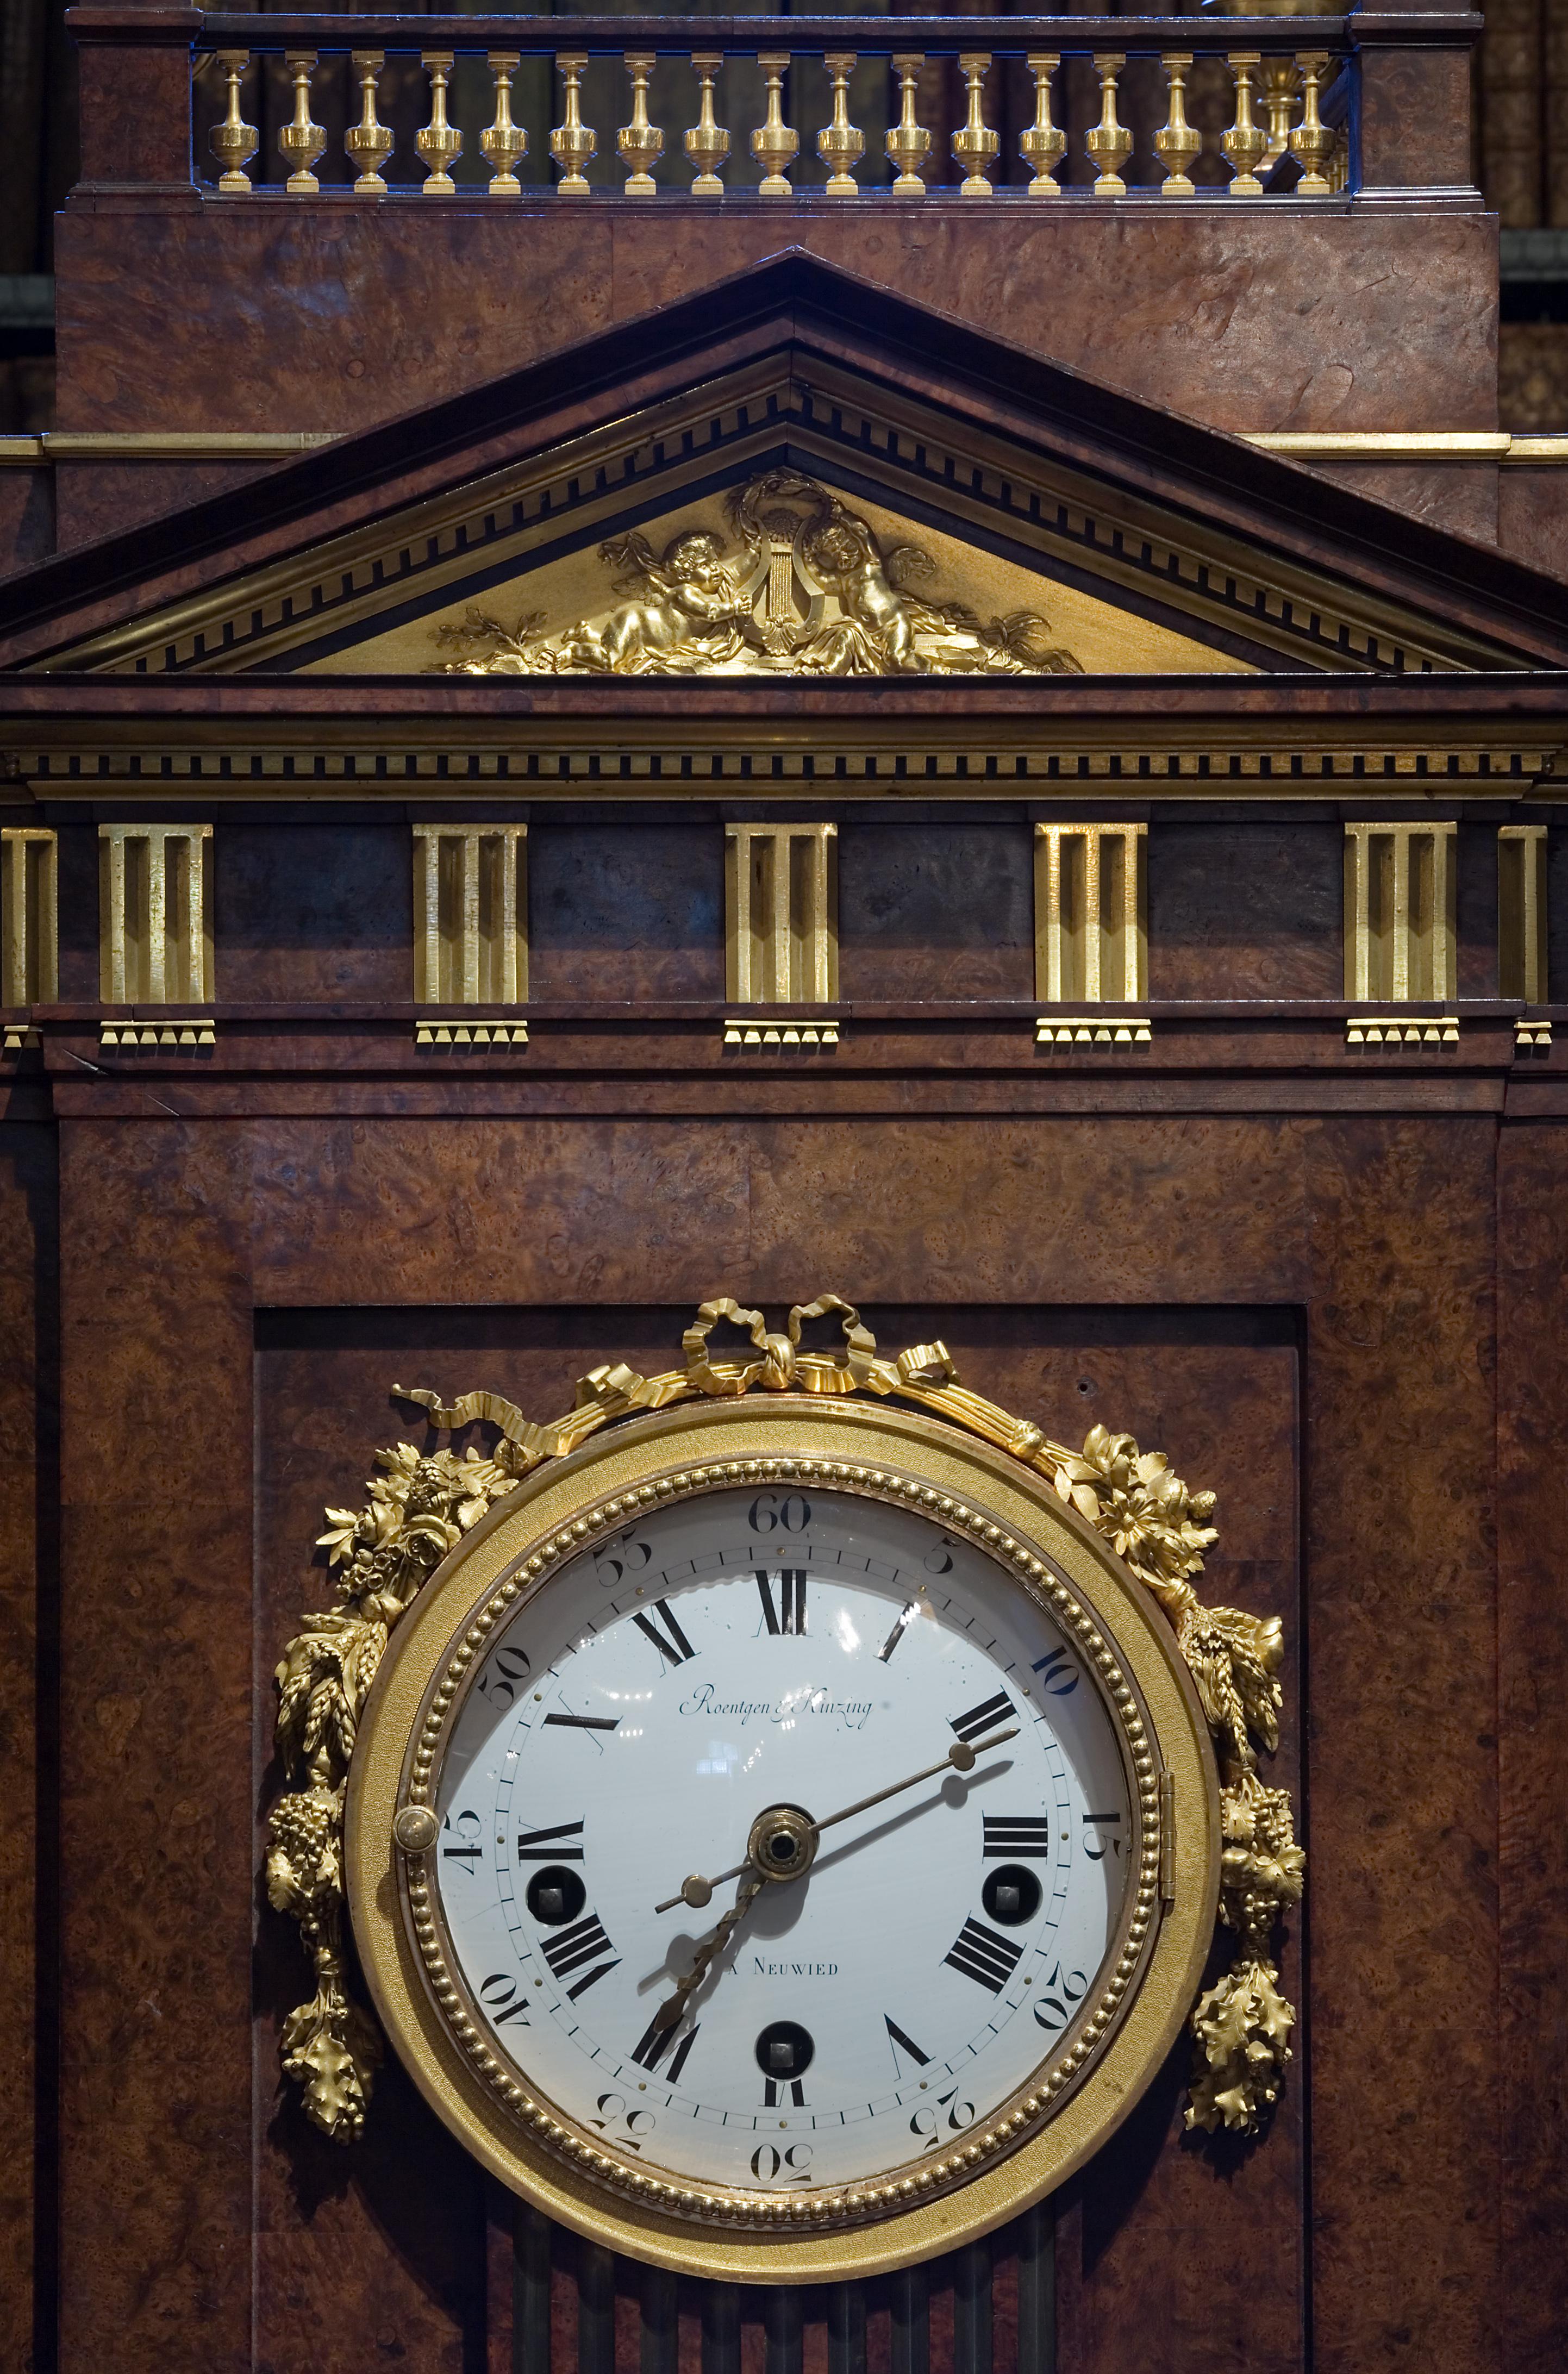 Filevienna baroque wall clock 6512g wikimedia commons filevienna baroque wall clock 6512g amipublicfo Images